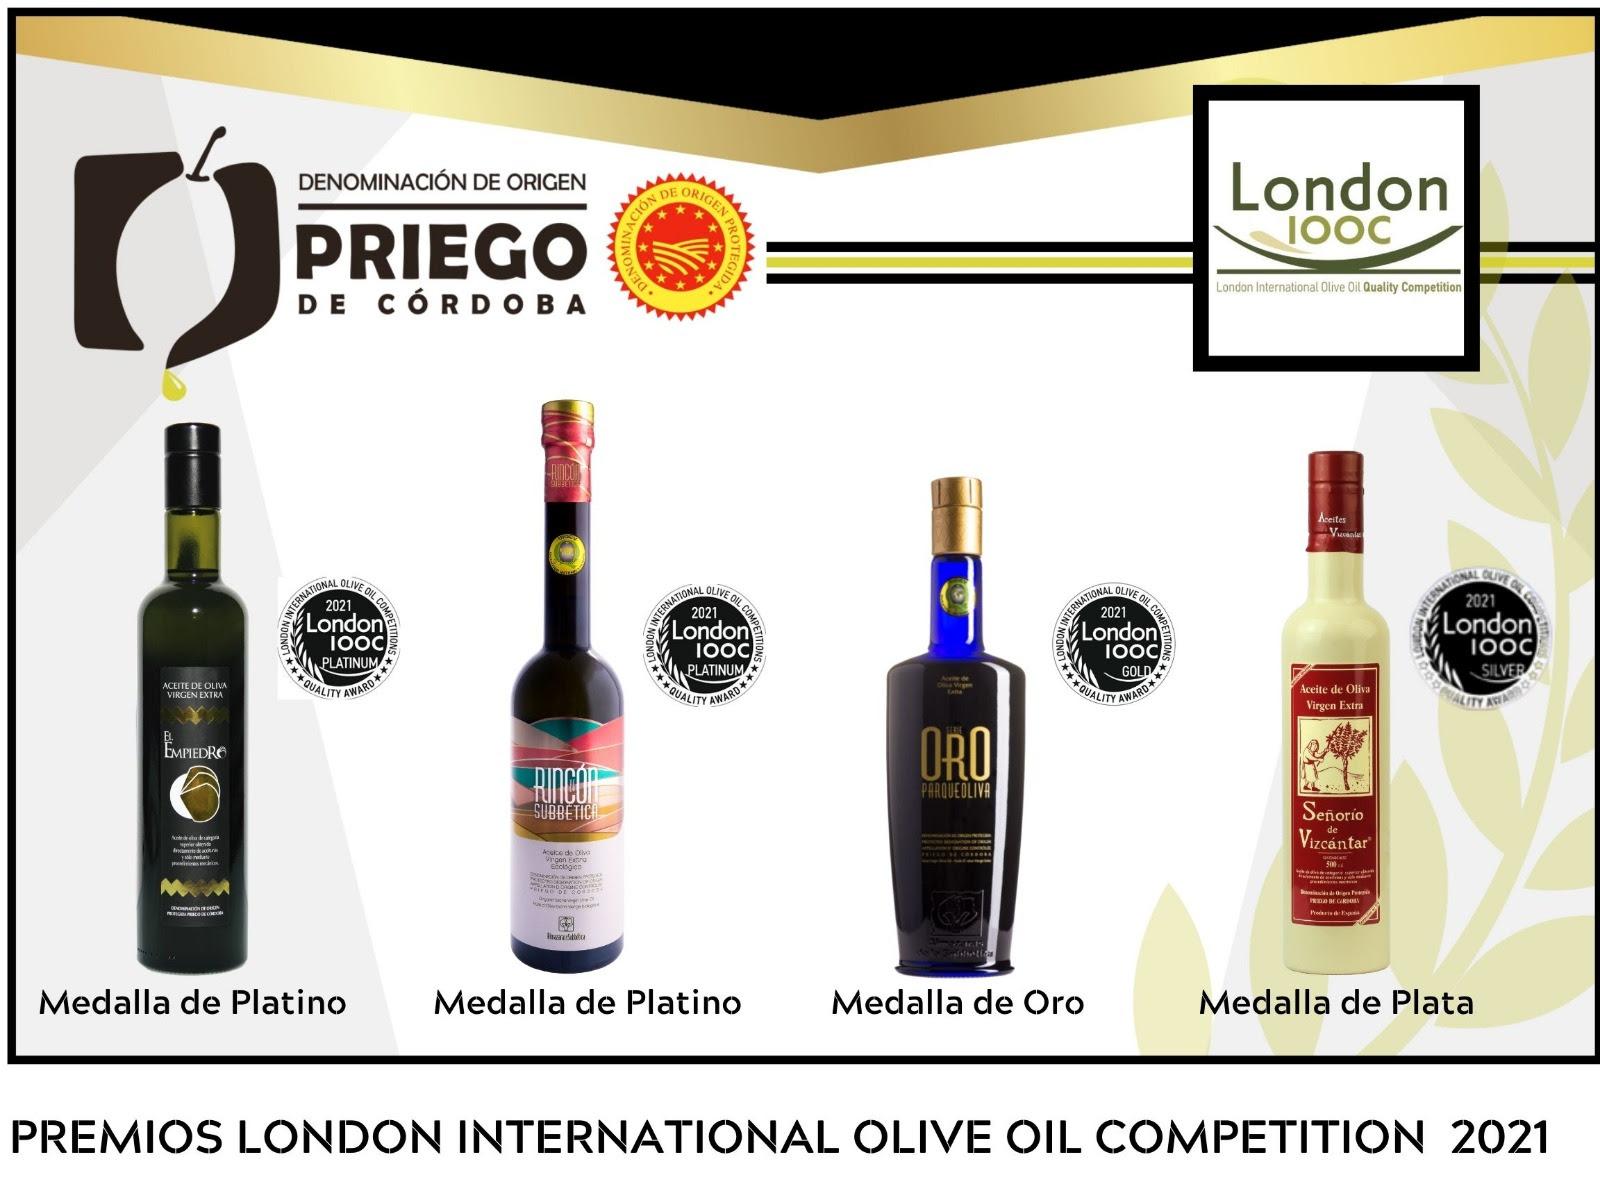 Premios London Internacional - DOP Priego de Córdoba